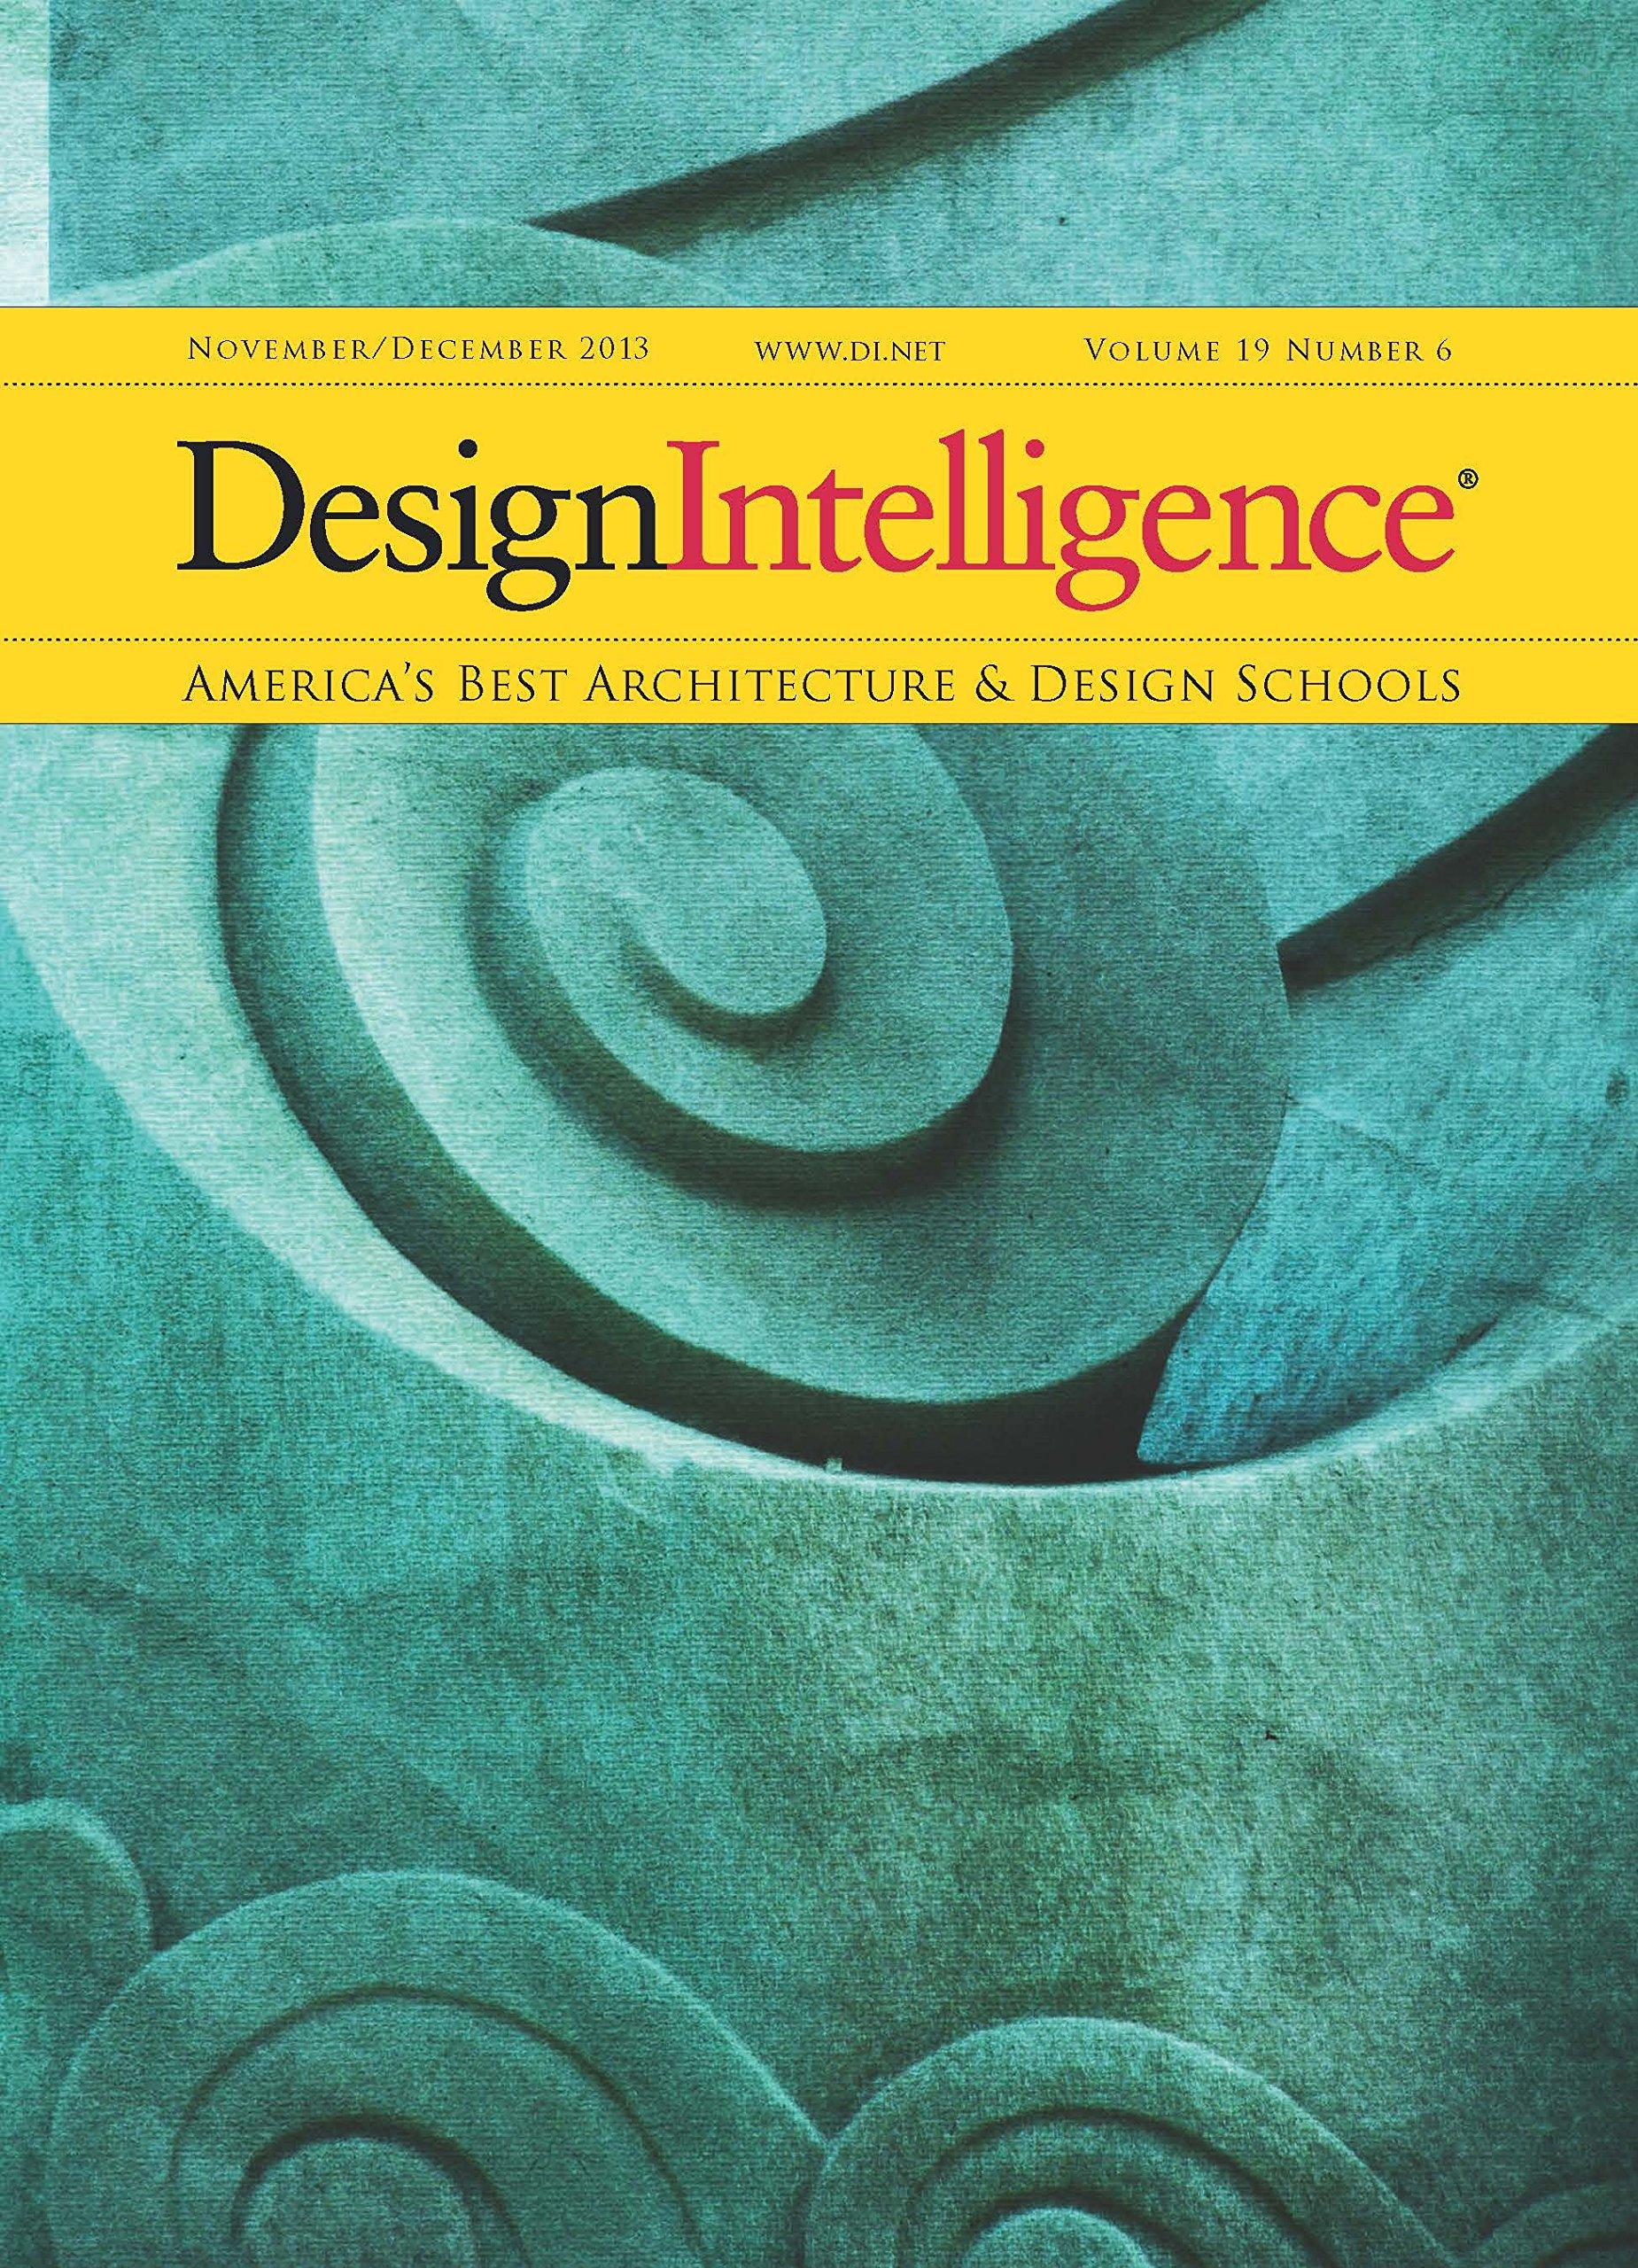 America's Best Architecture & Design Schools 2014 PDF